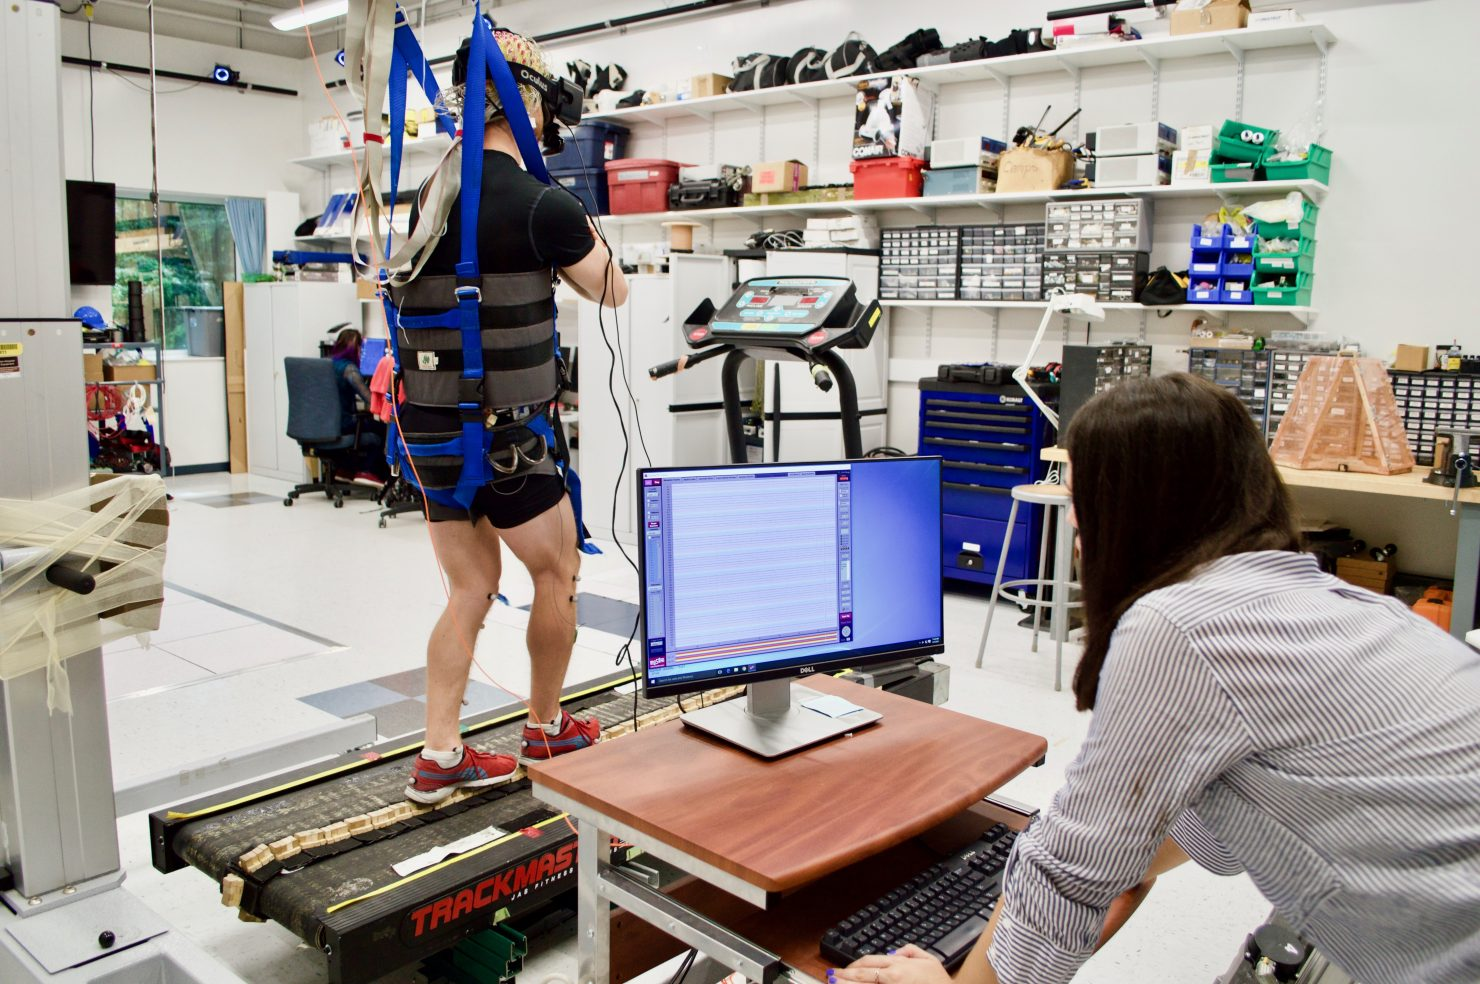 VR training the brain